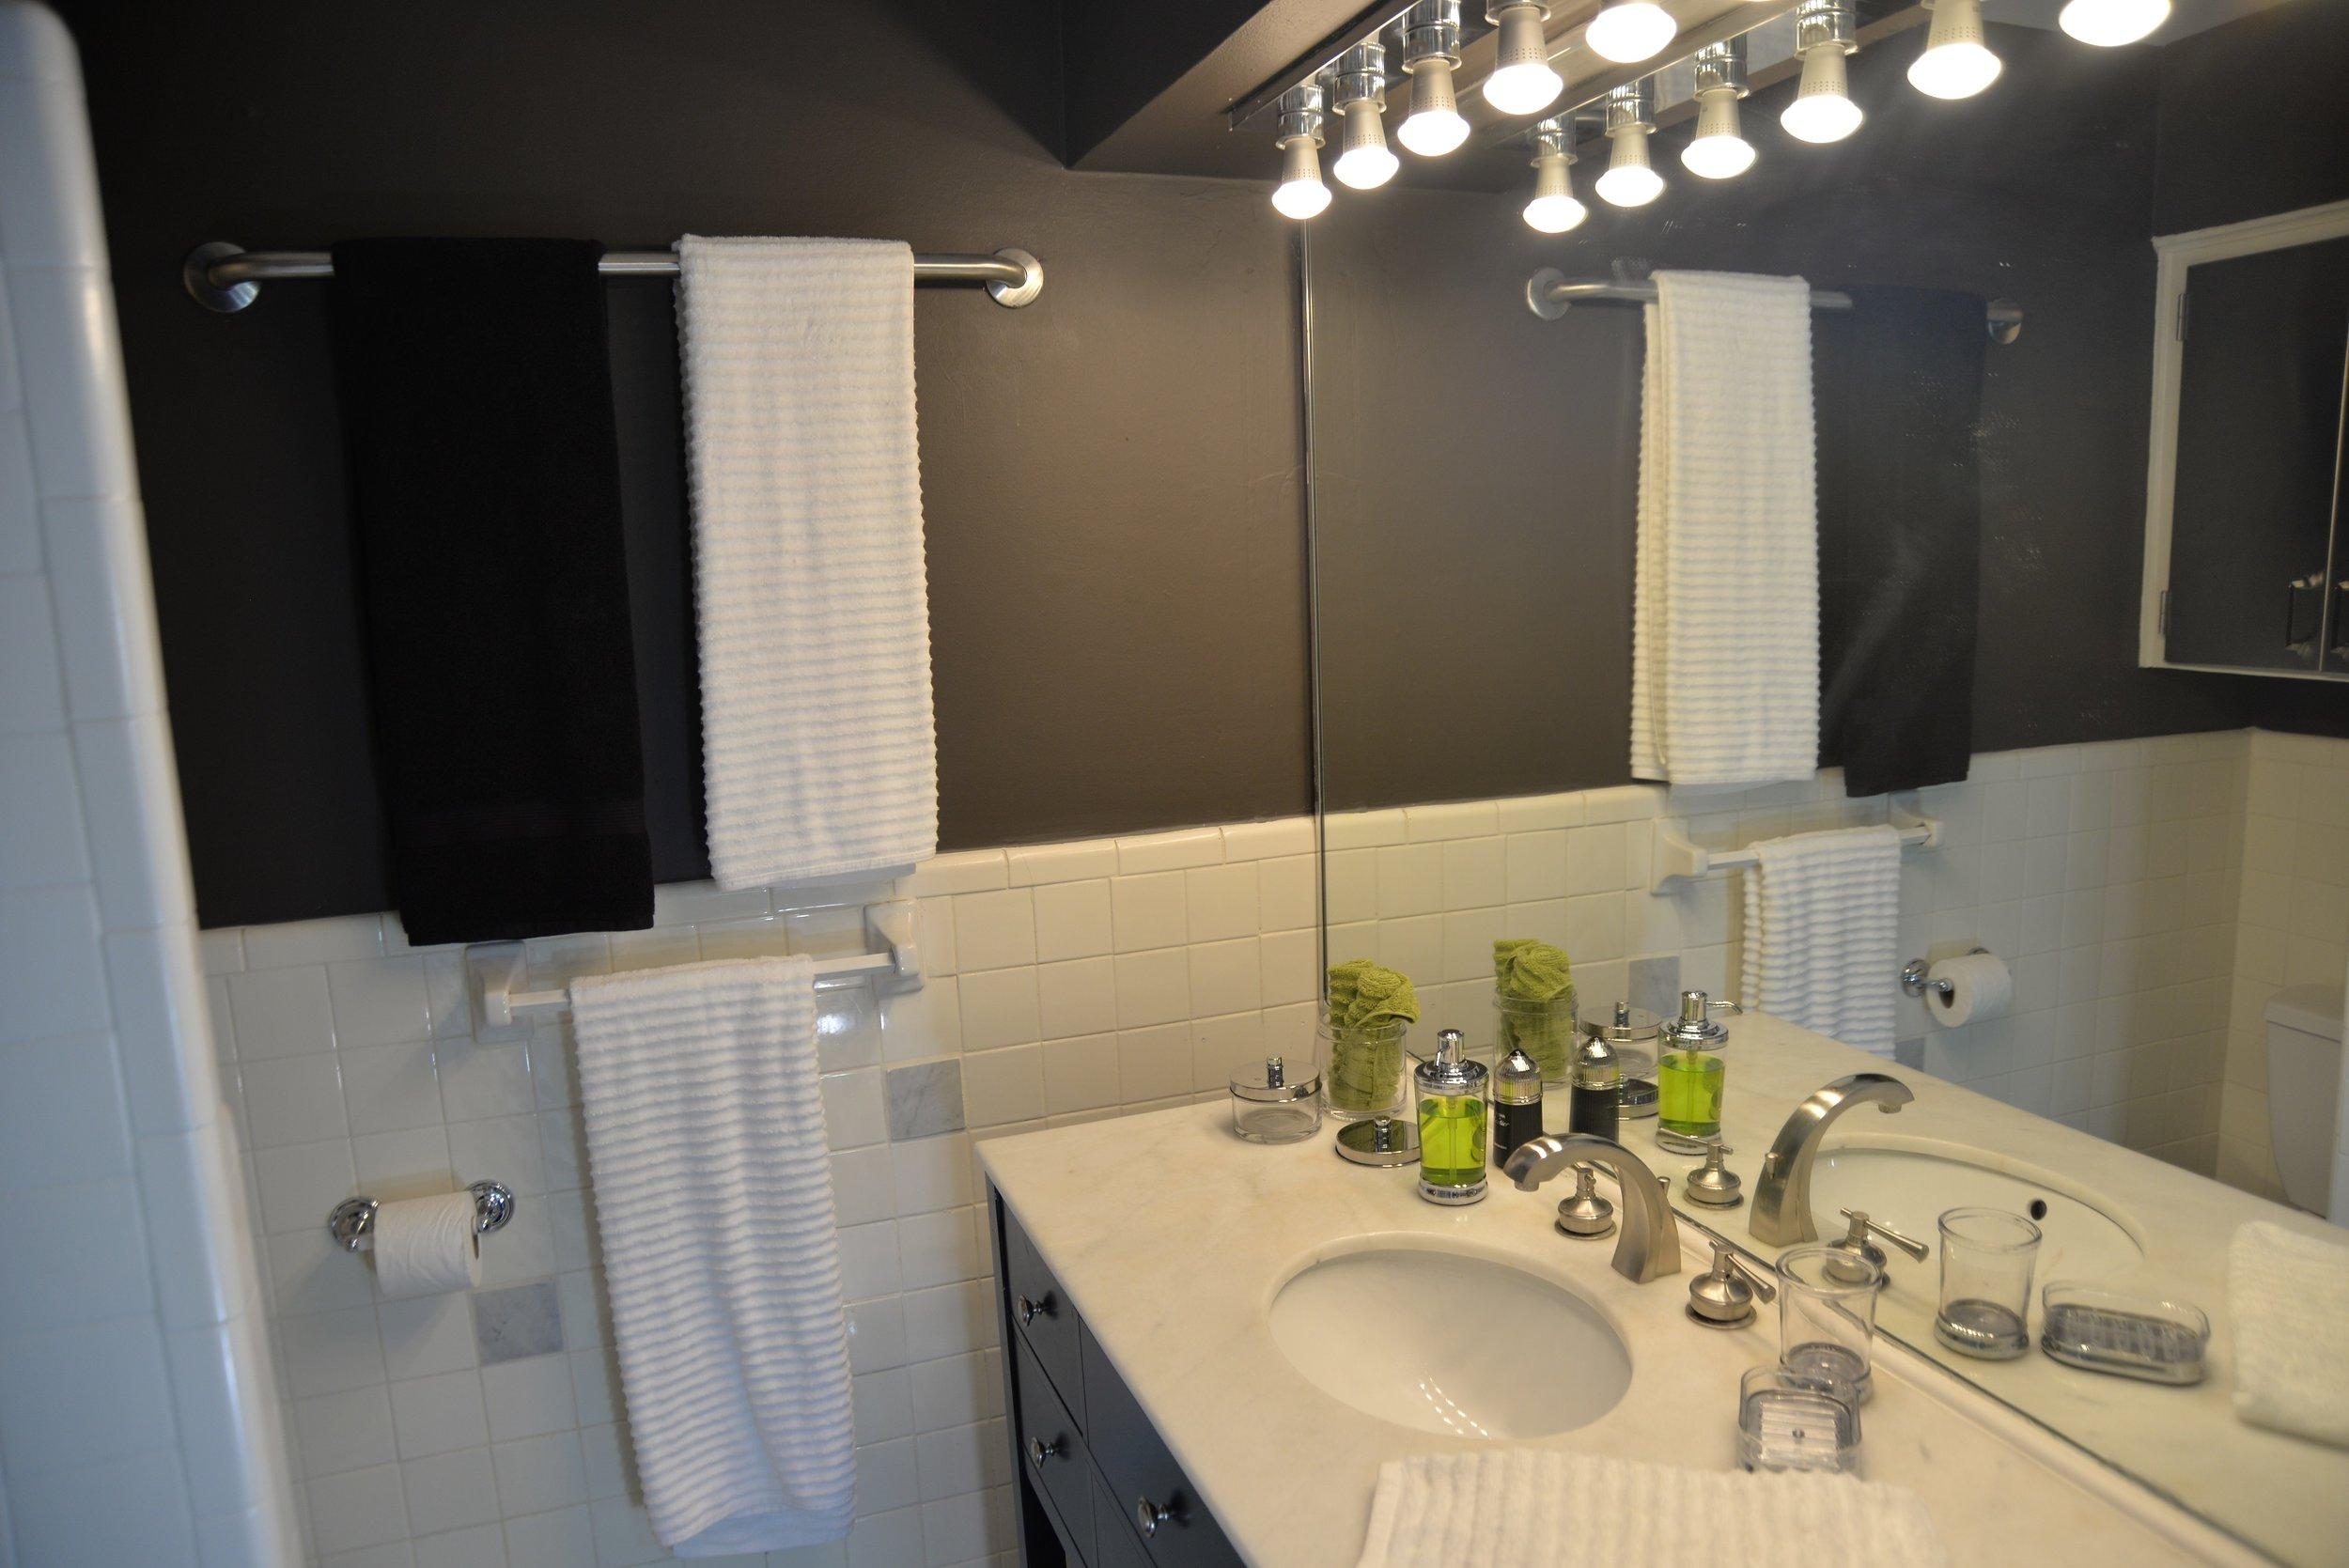 Apartment 5.9 Full Bath.JPG